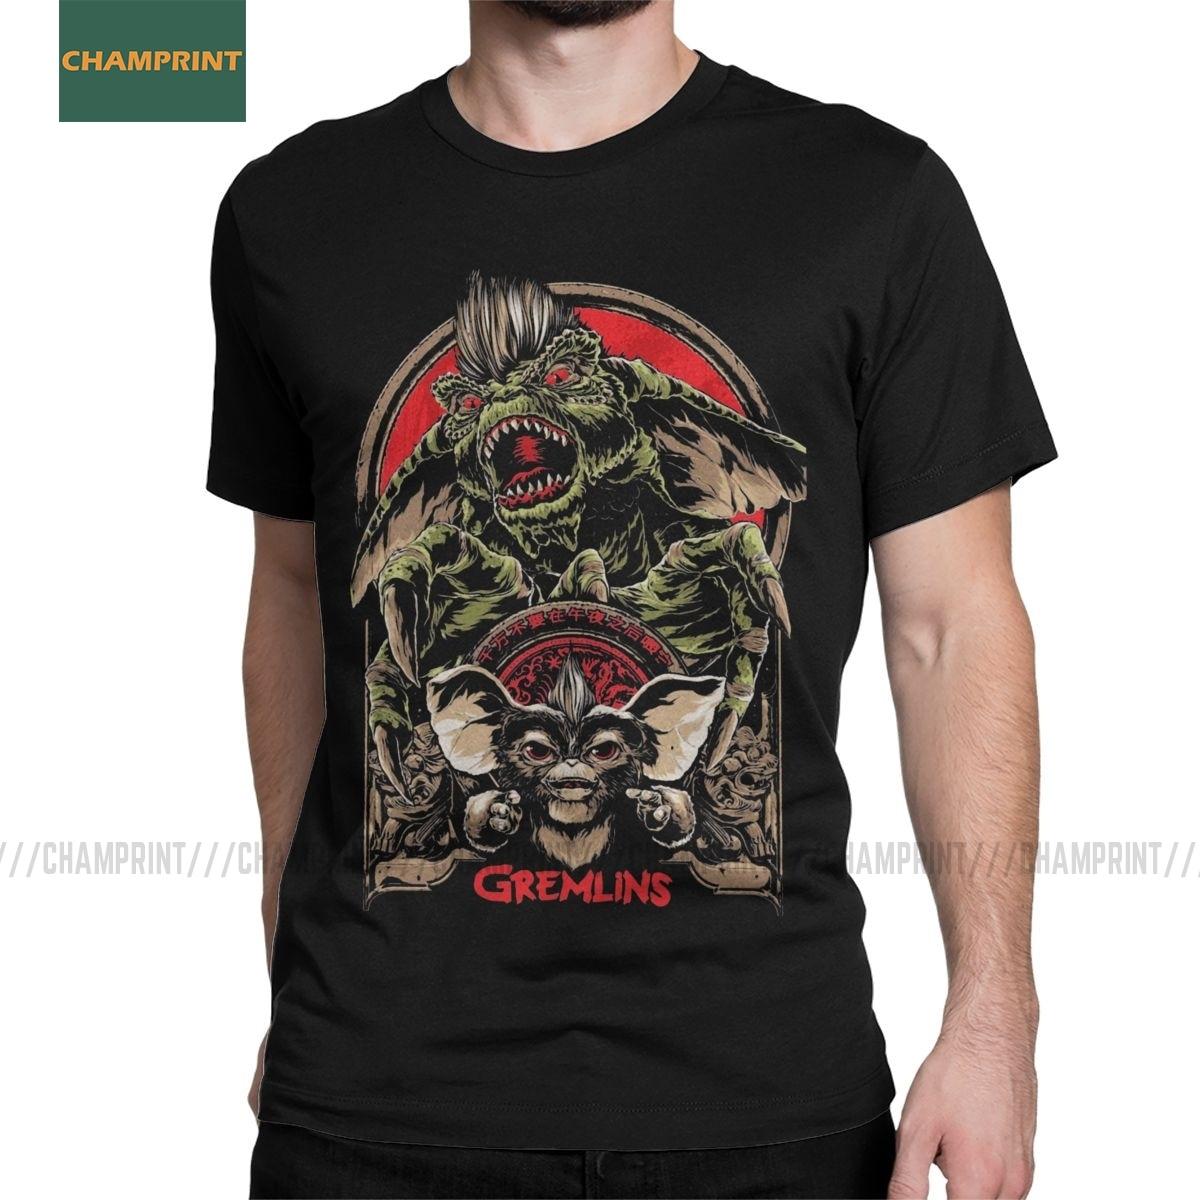 Camisetas para hombres Gremlins Gizmo 80s Movie momwai Monster Horror Retro Sci Fi camisetas creativas de manga corta de algodón 6XL